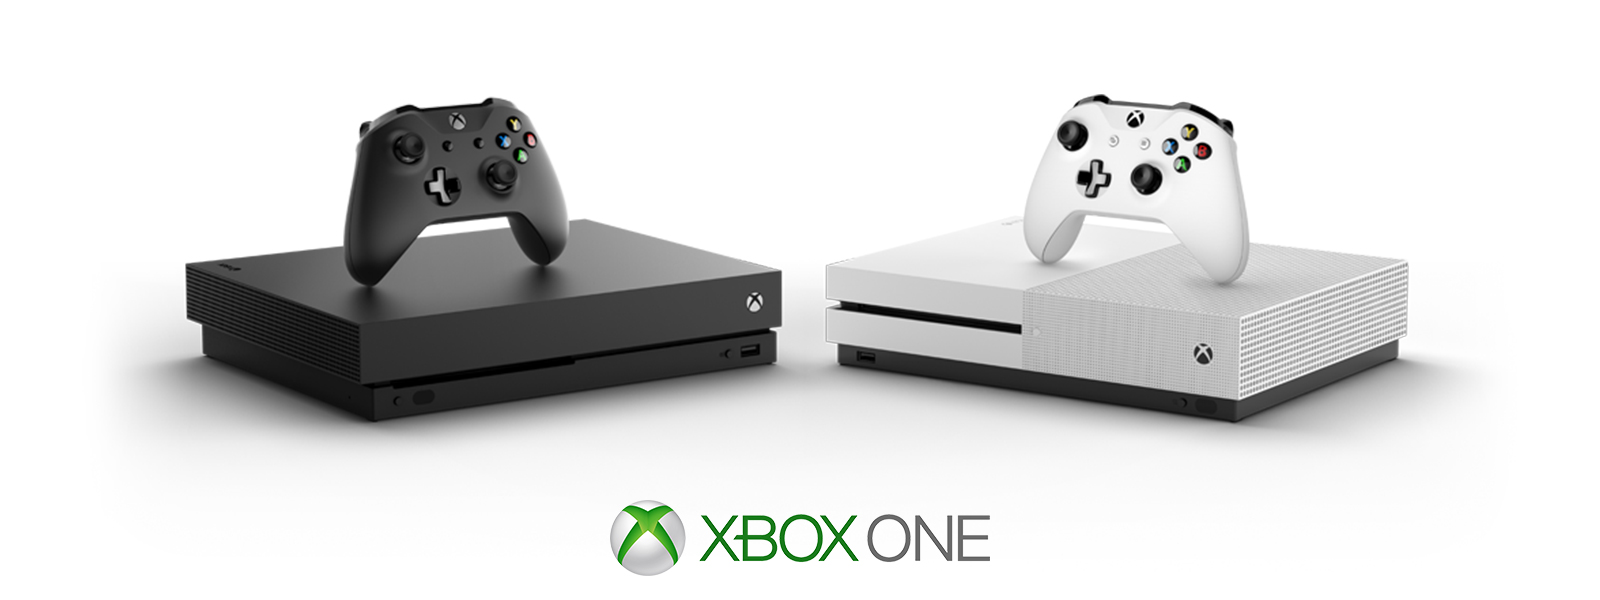 Xbox One X und Xbox One S